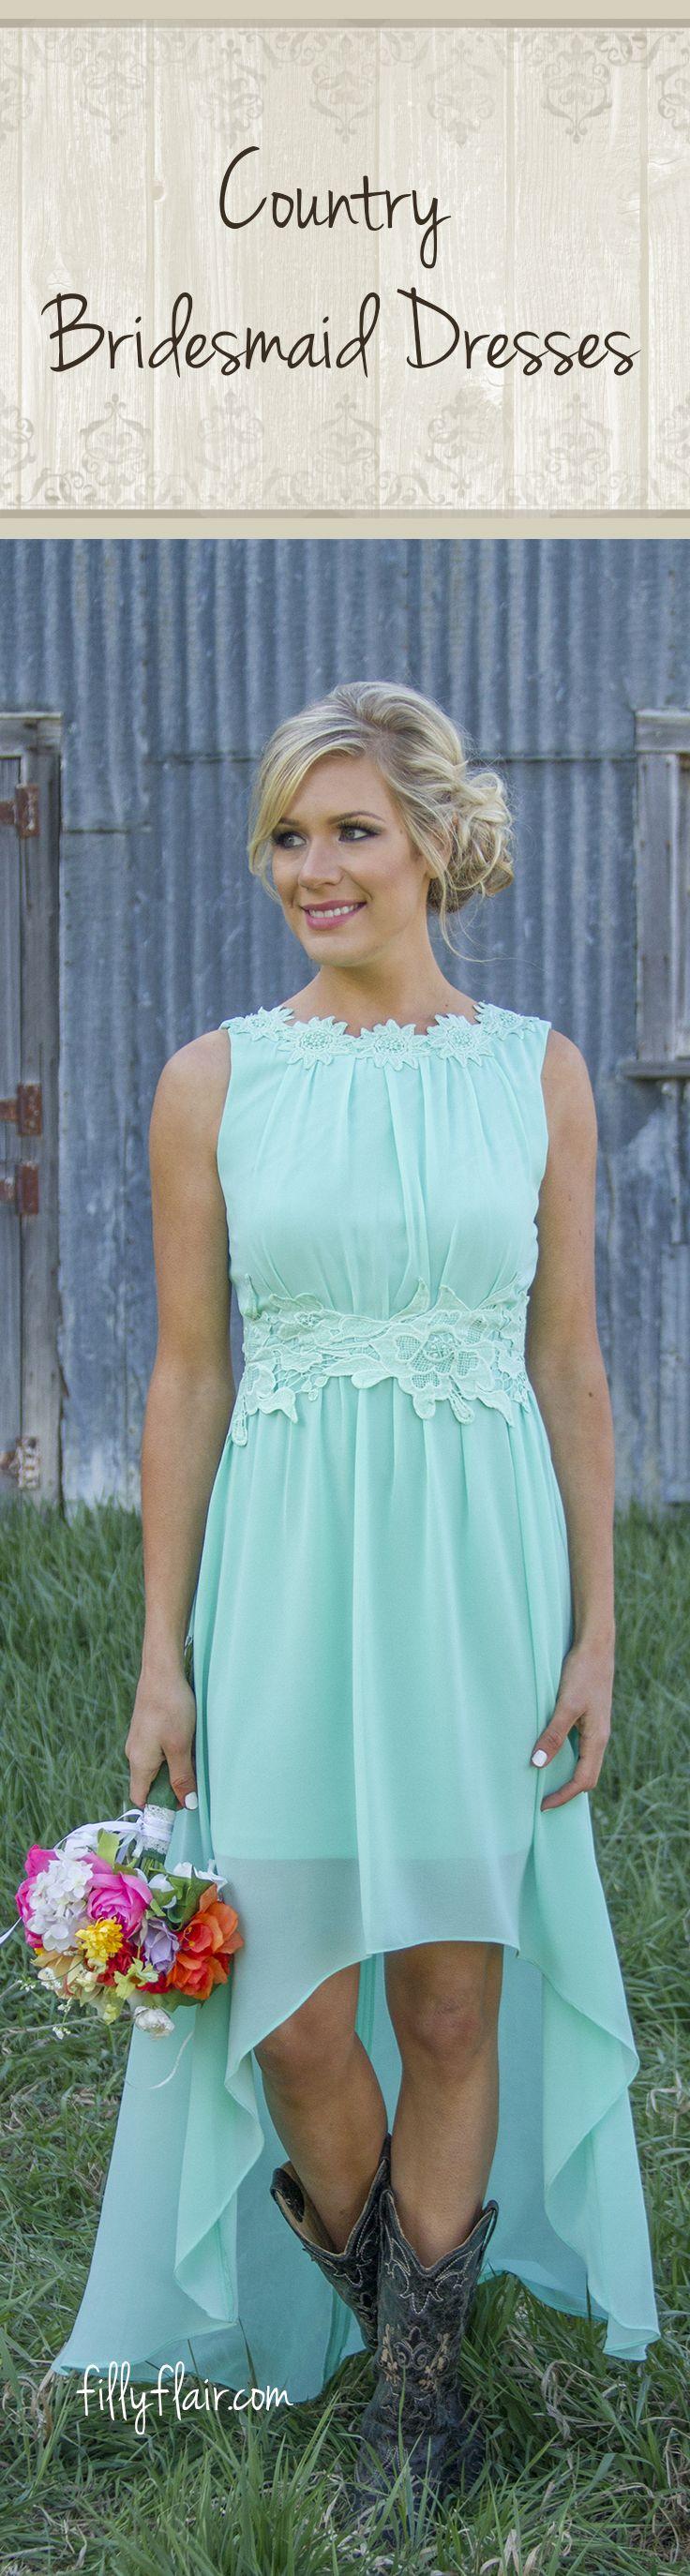 262 best Bridesmaid/maid of honour dress ideas images on Pinterest ...